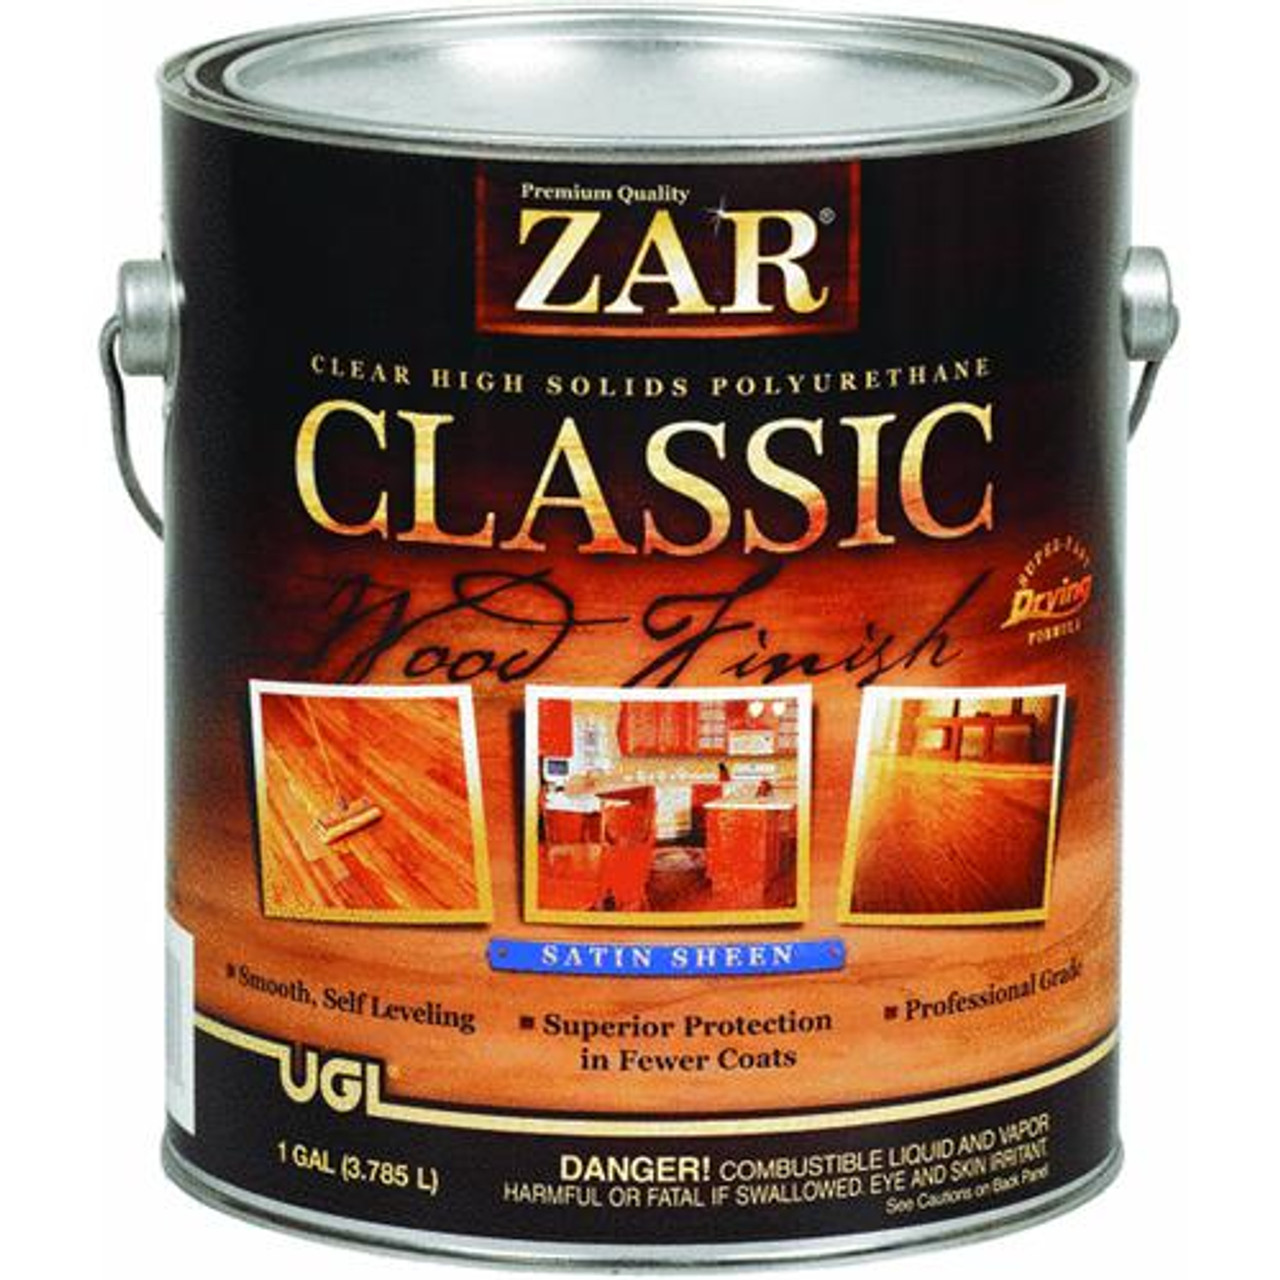 ZAR Classic High Solids Oil Based Polyurethane Varnish